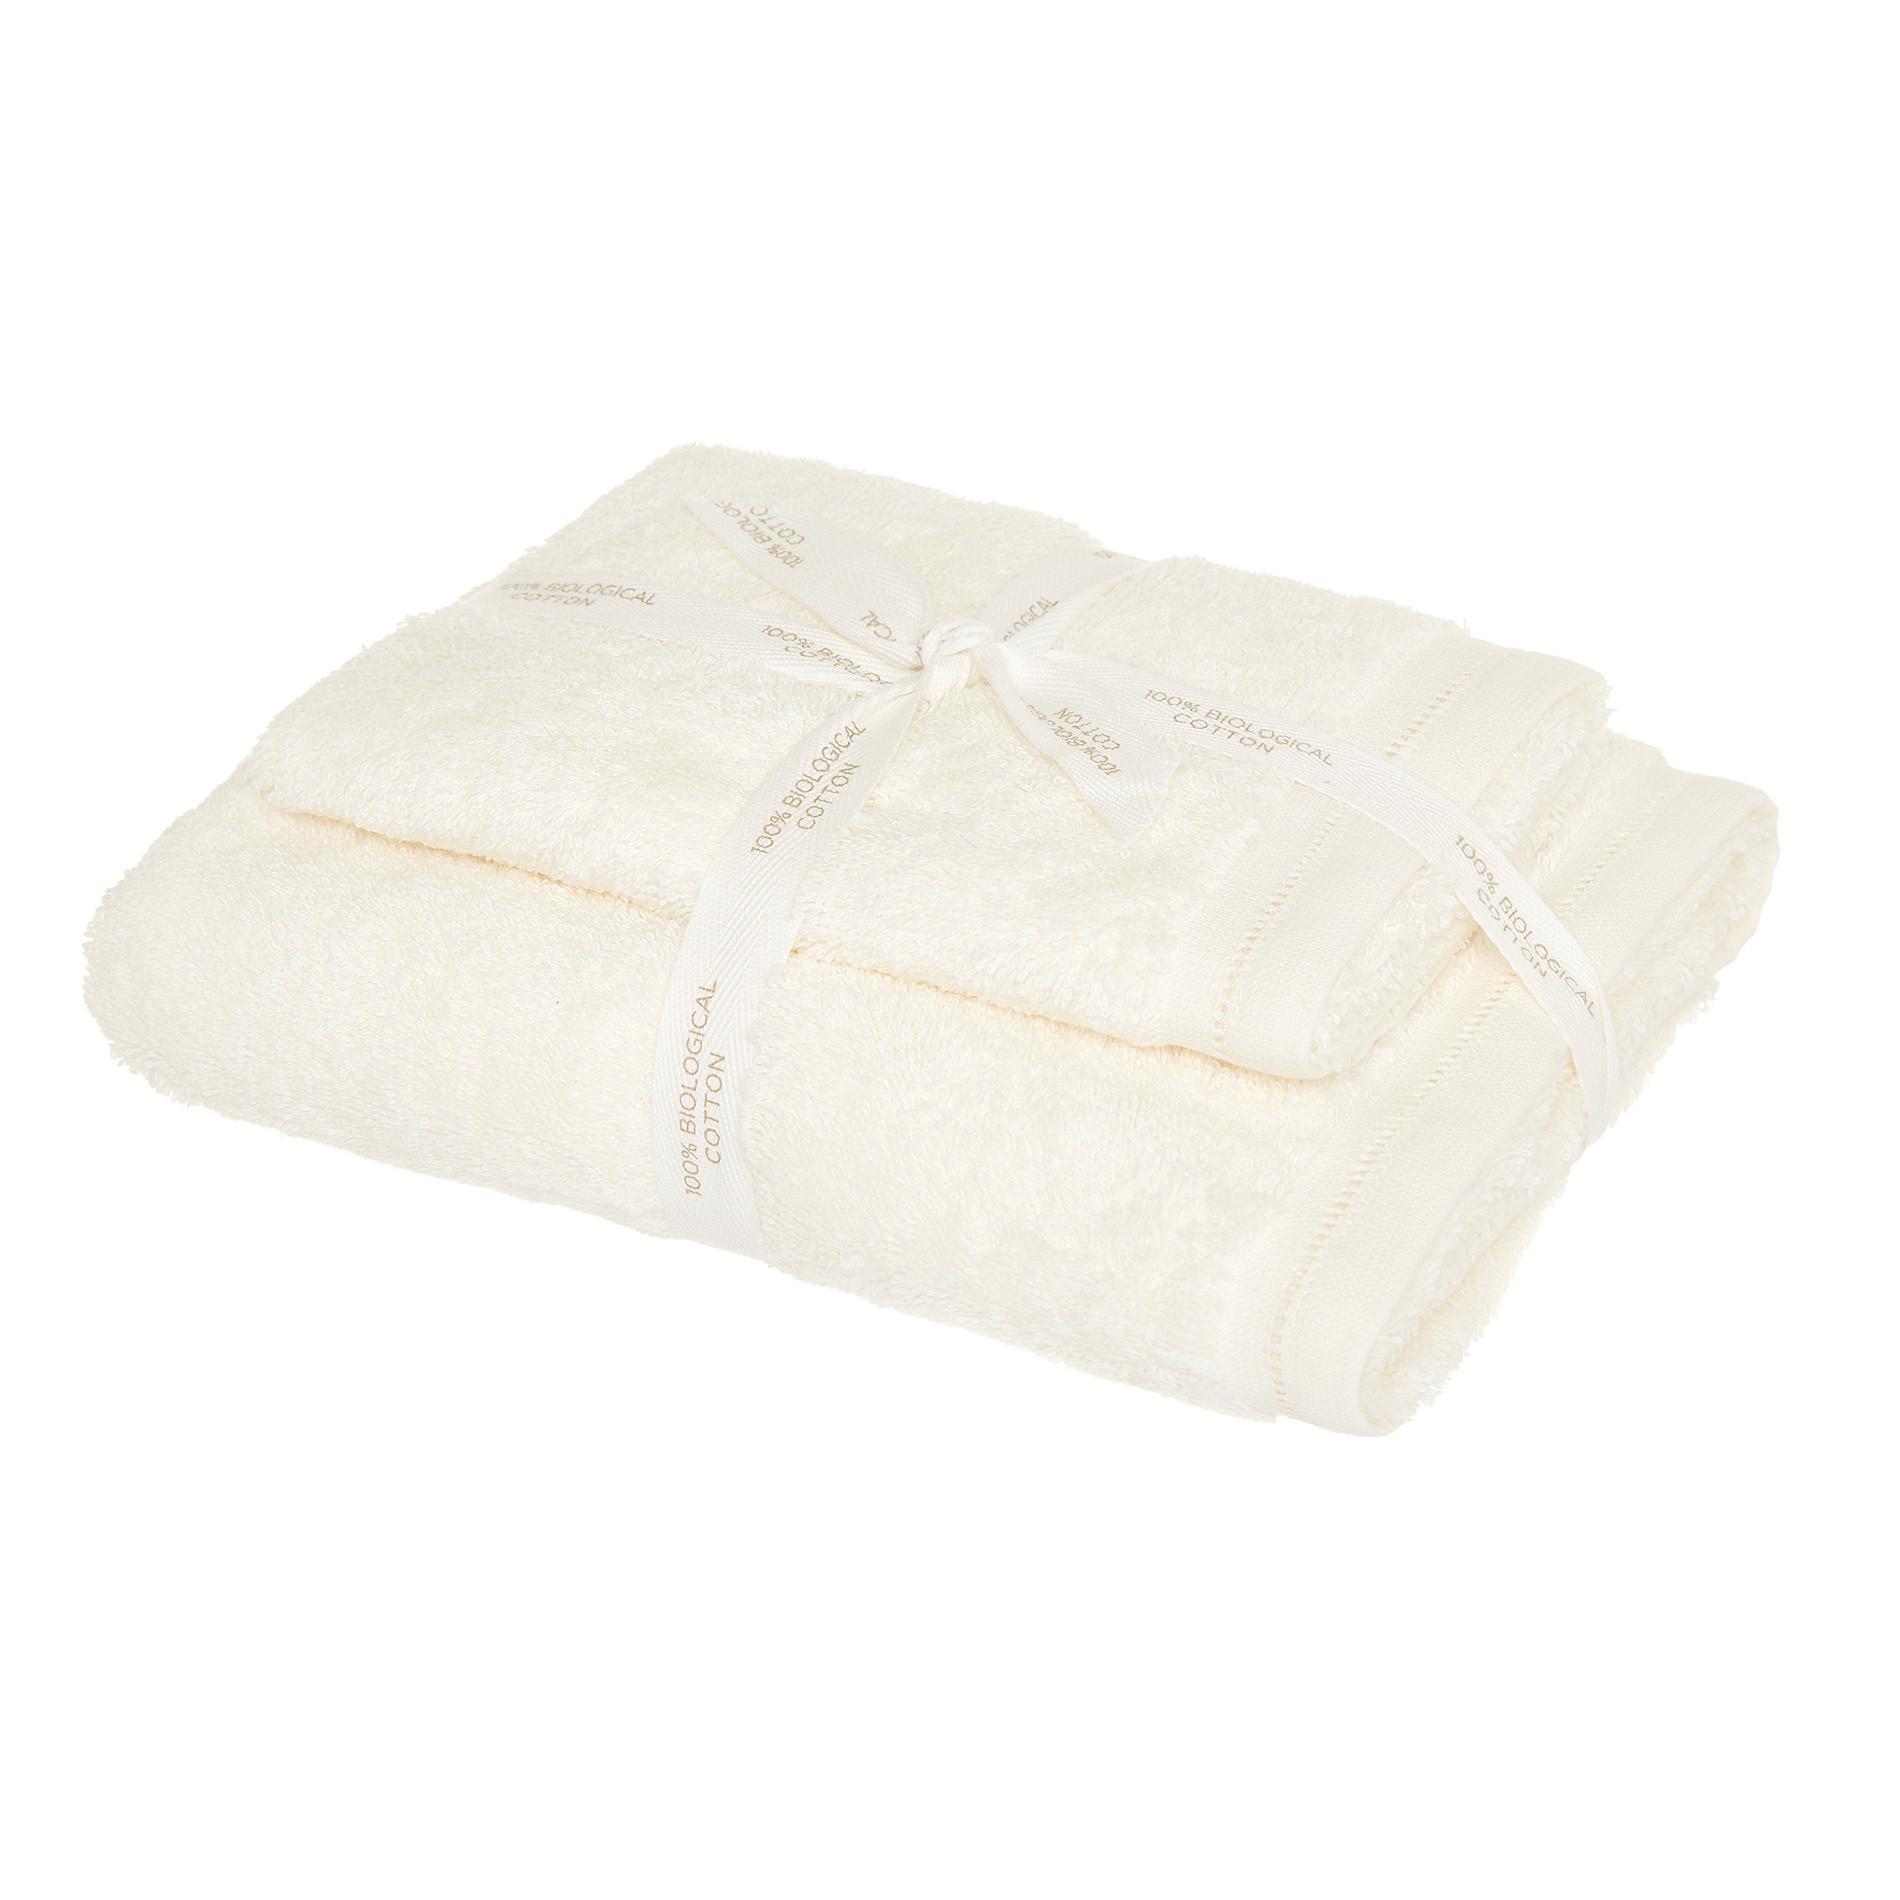 Set 2 asciugamani cotone biologico tinta unita, Bianco, large image number 0